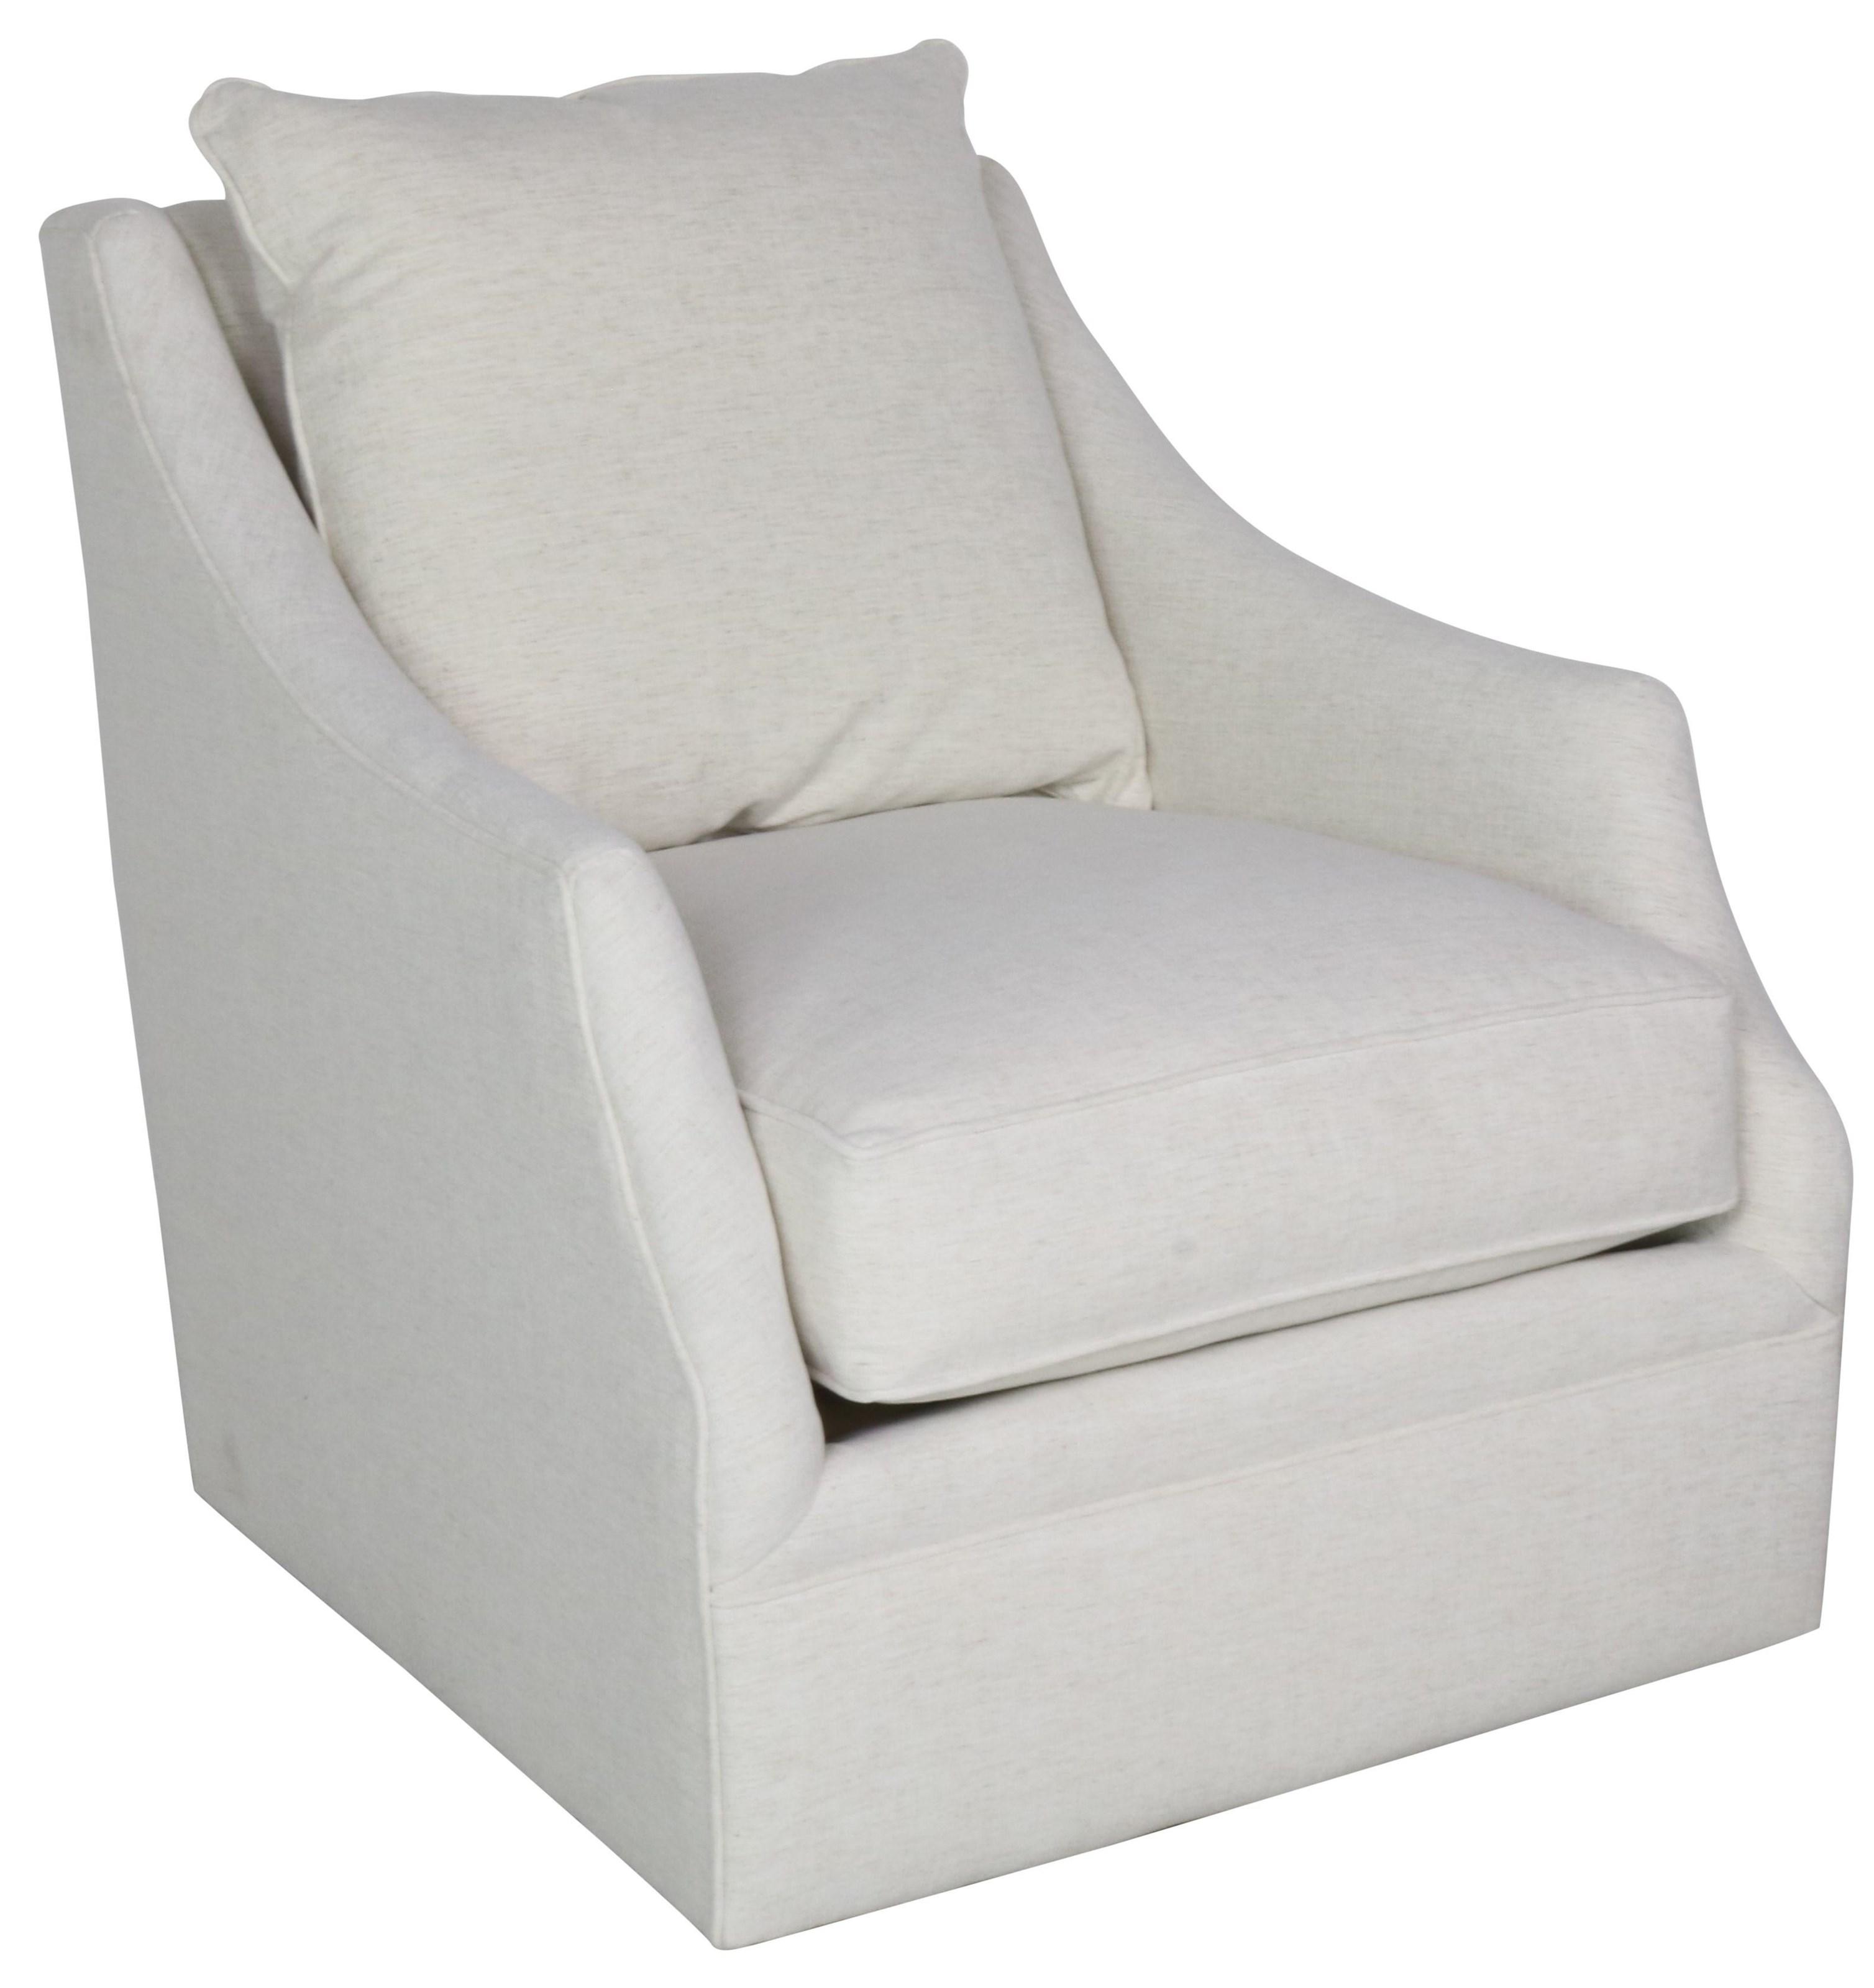 Kara Swivel Chair by Robin Bruce at Sprintz Furniture